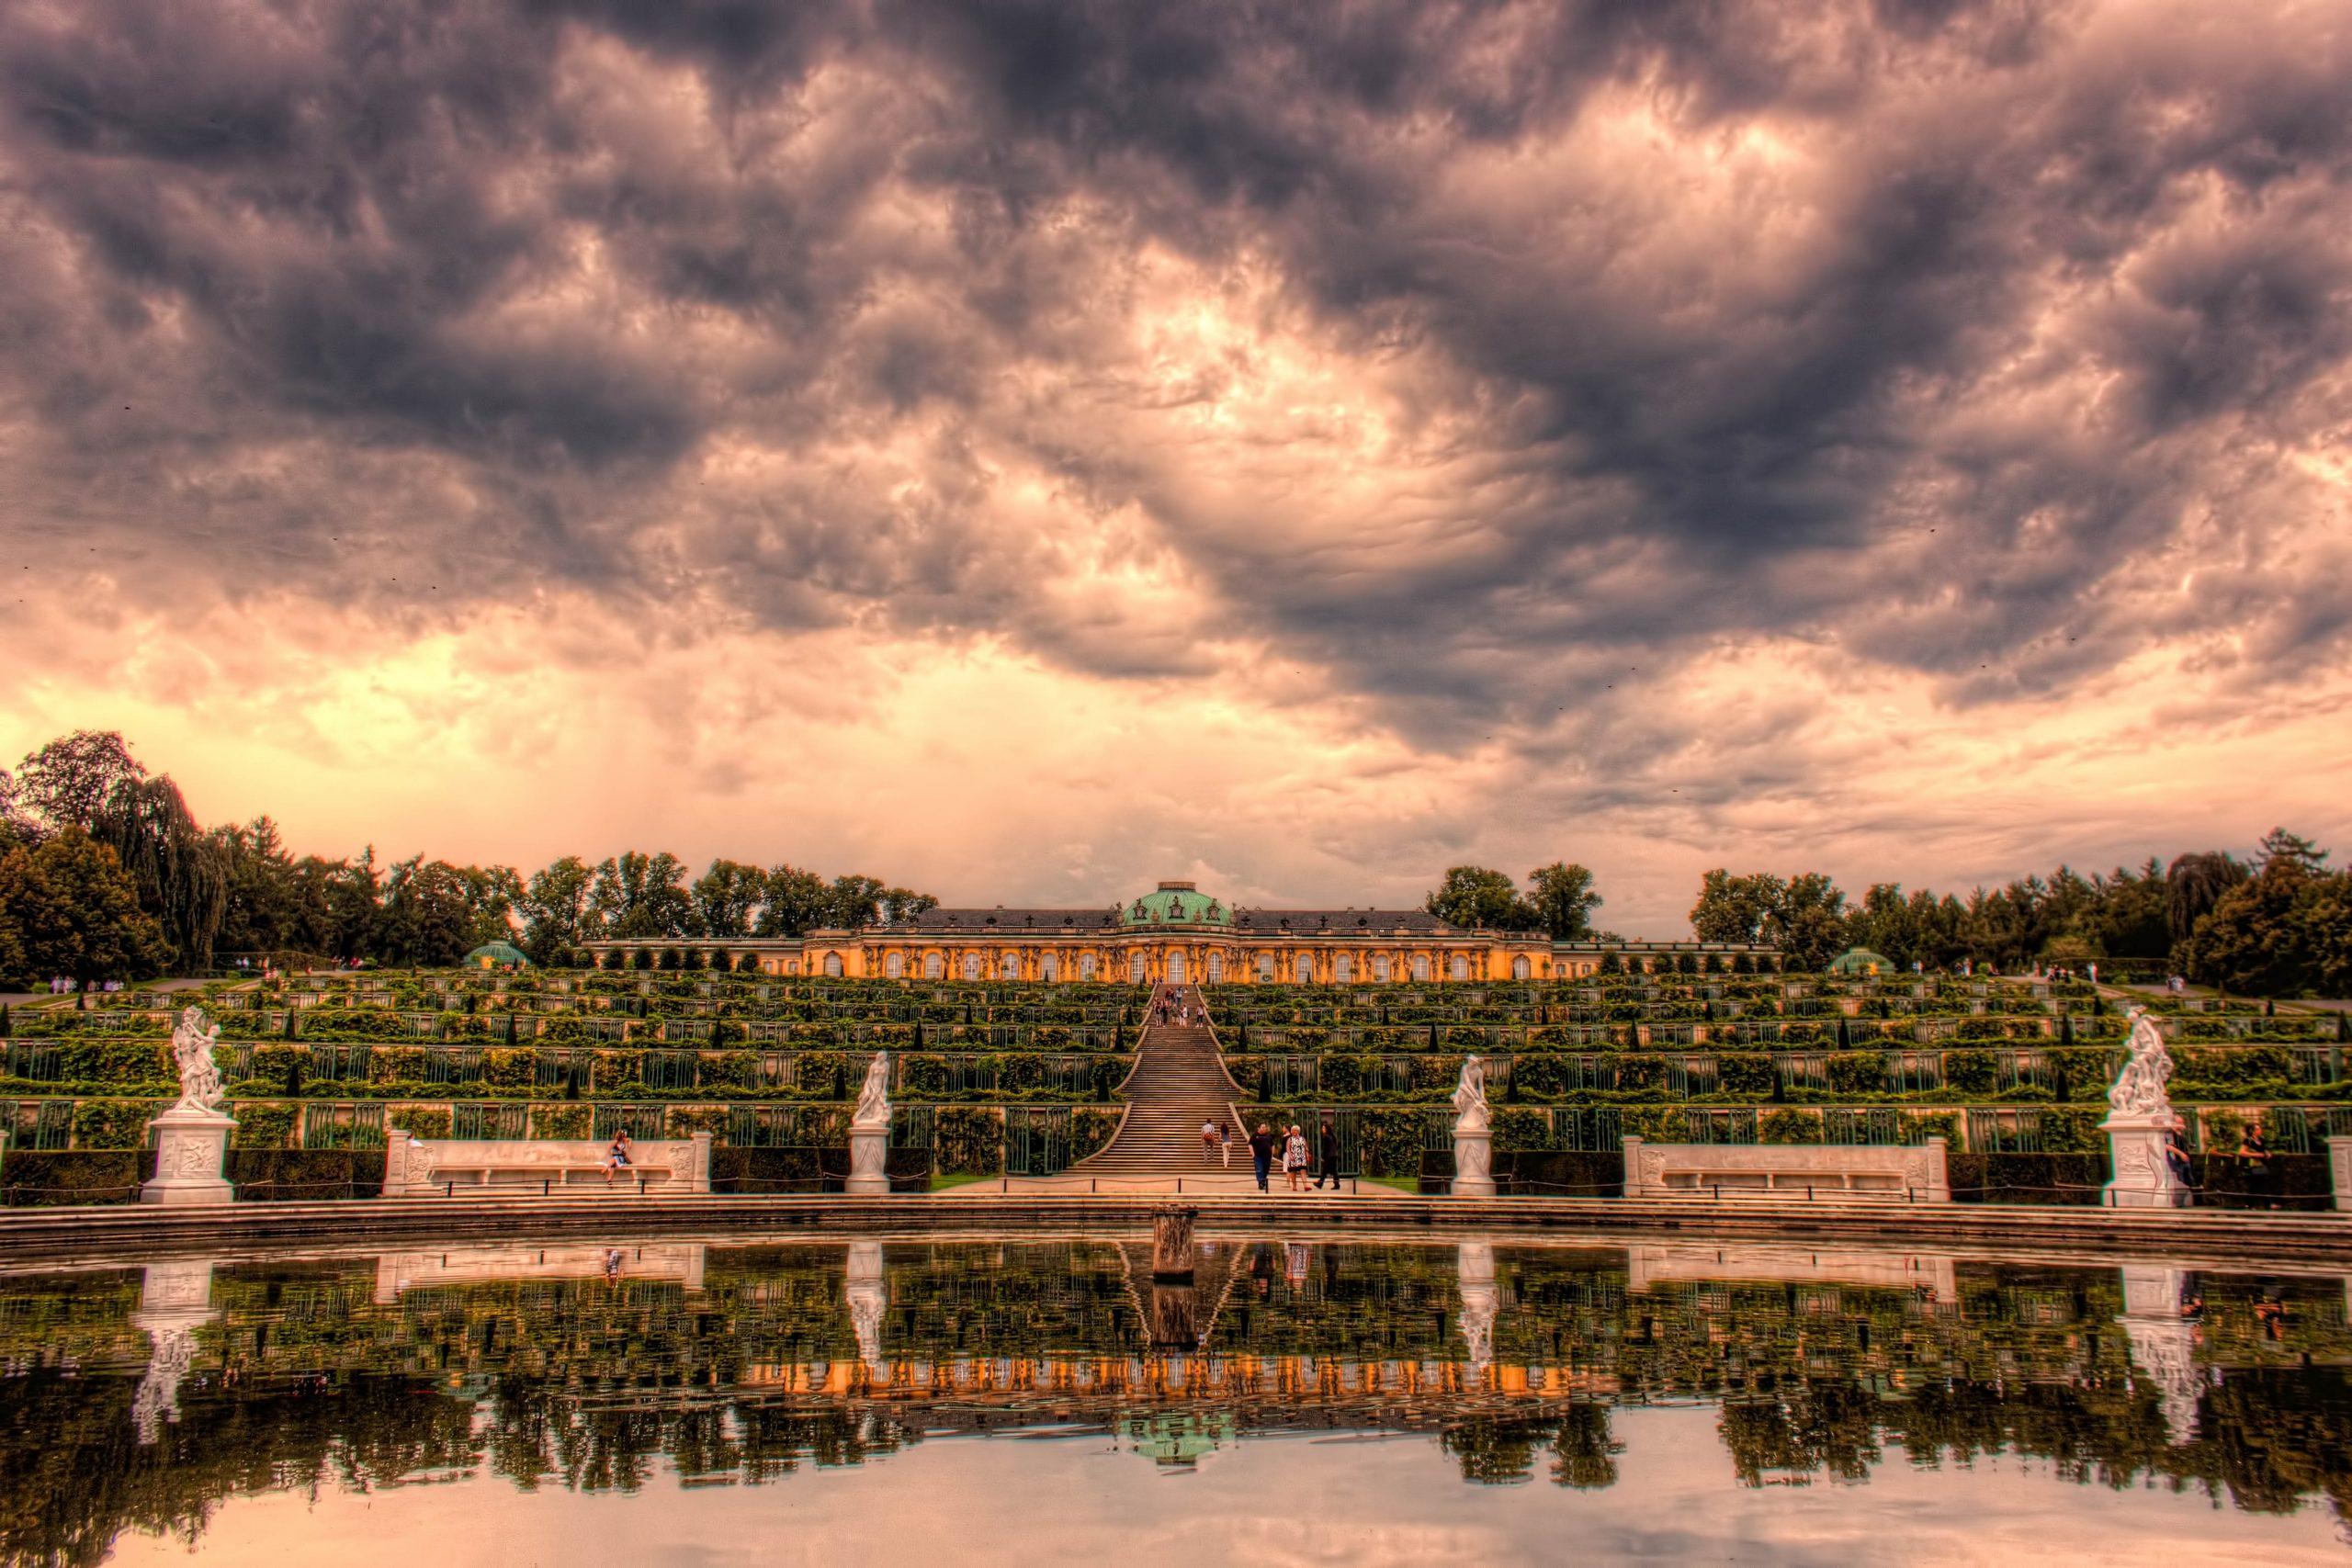 Potsdam Sanssouci, Germany